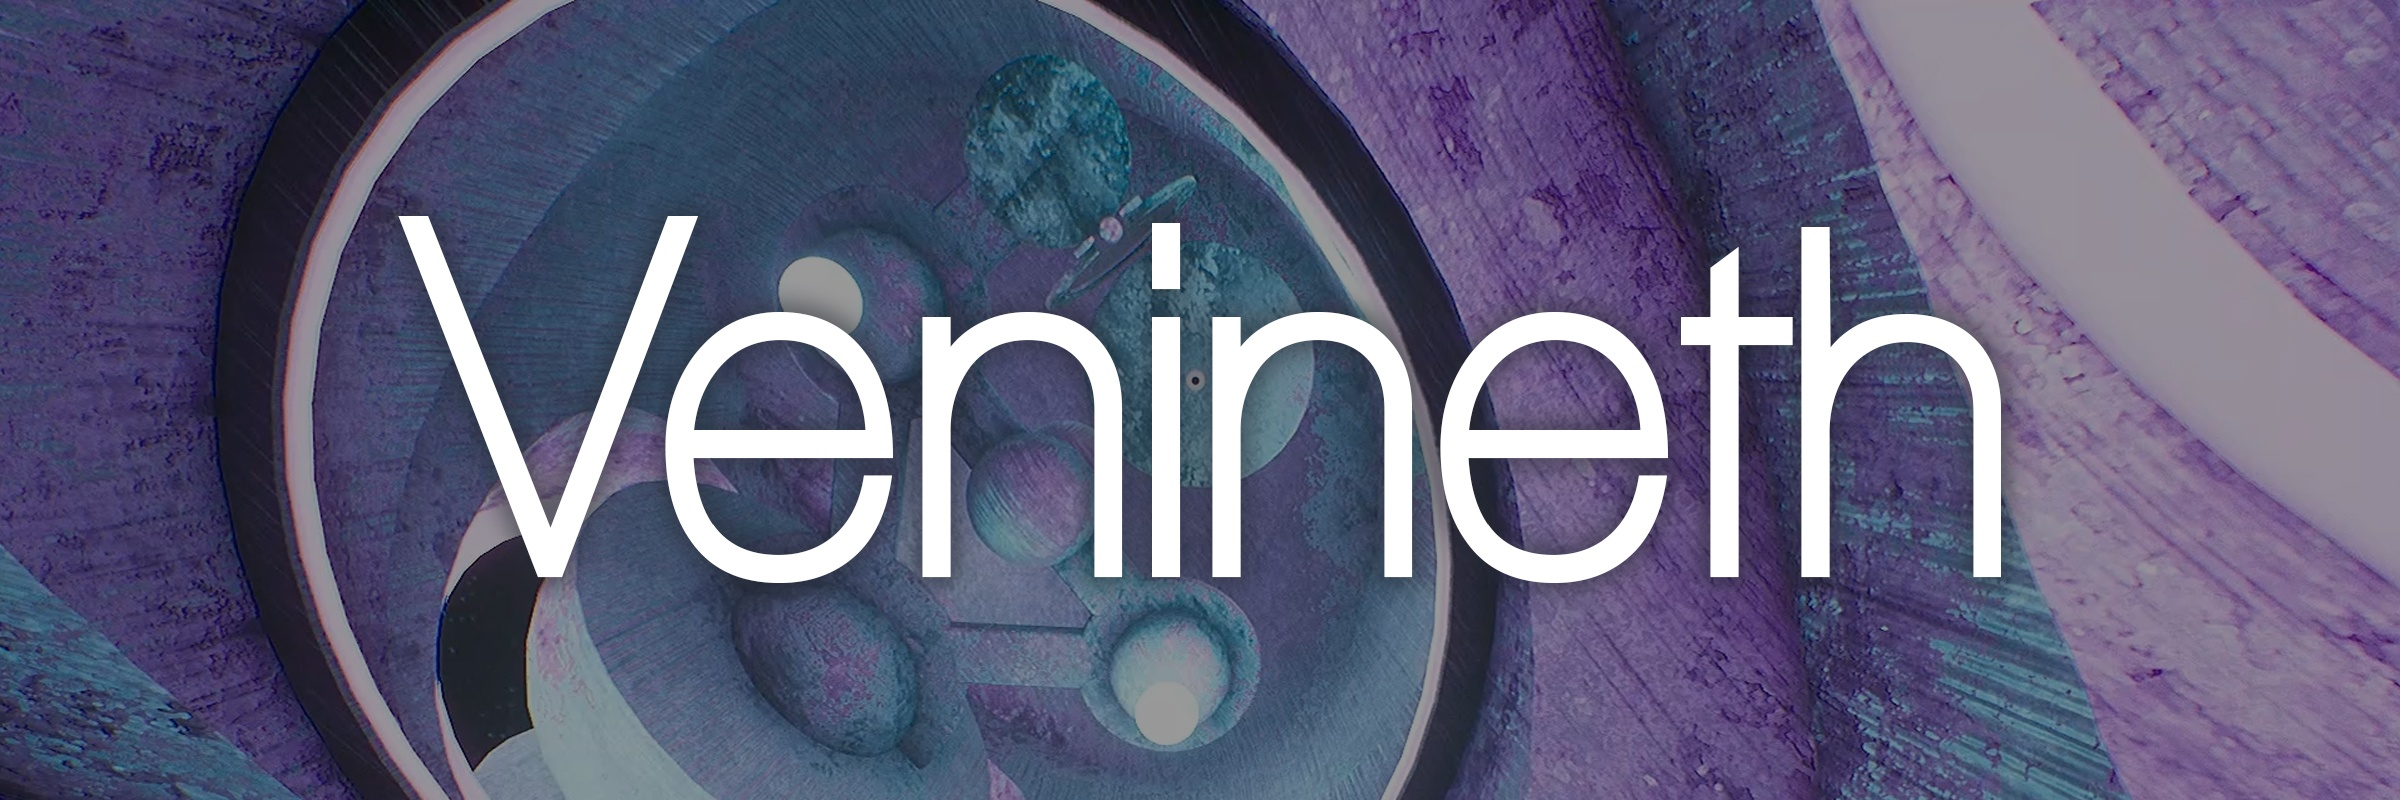 Venineth - Beitragsbild